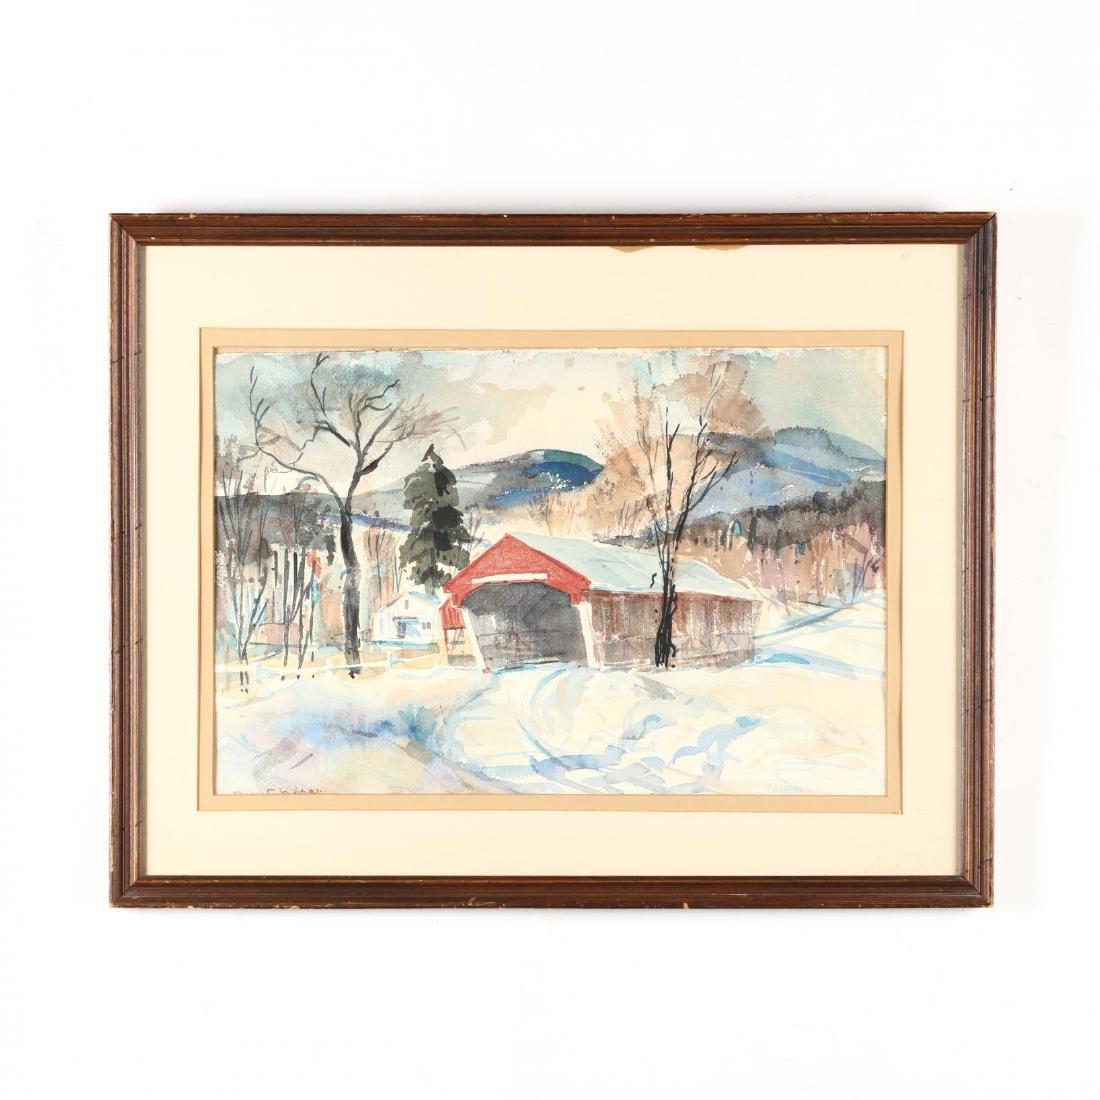 David Curtis Baker (NH/MA, 1915-1999), Mountainscape